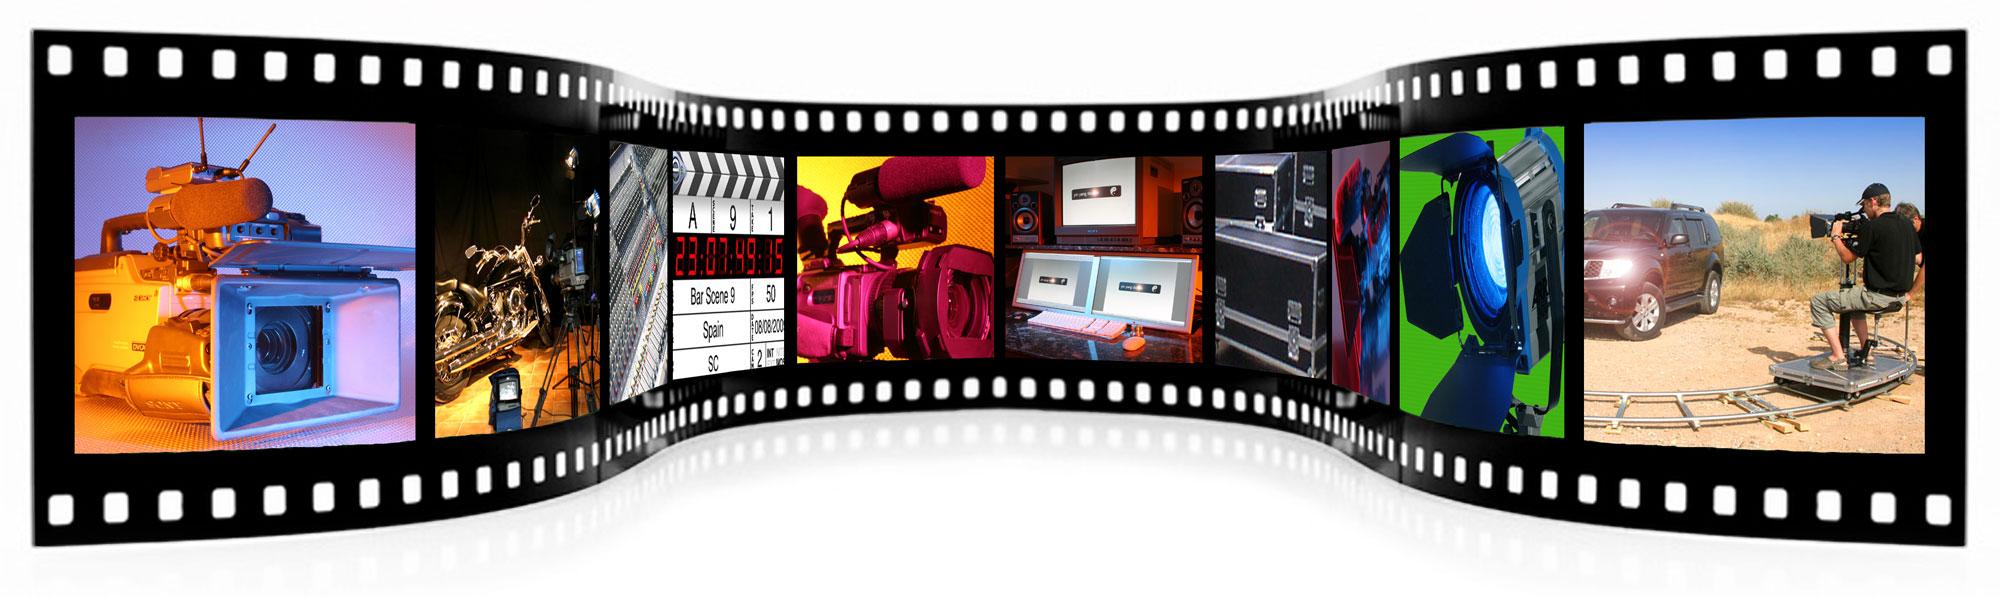 Video Production Media